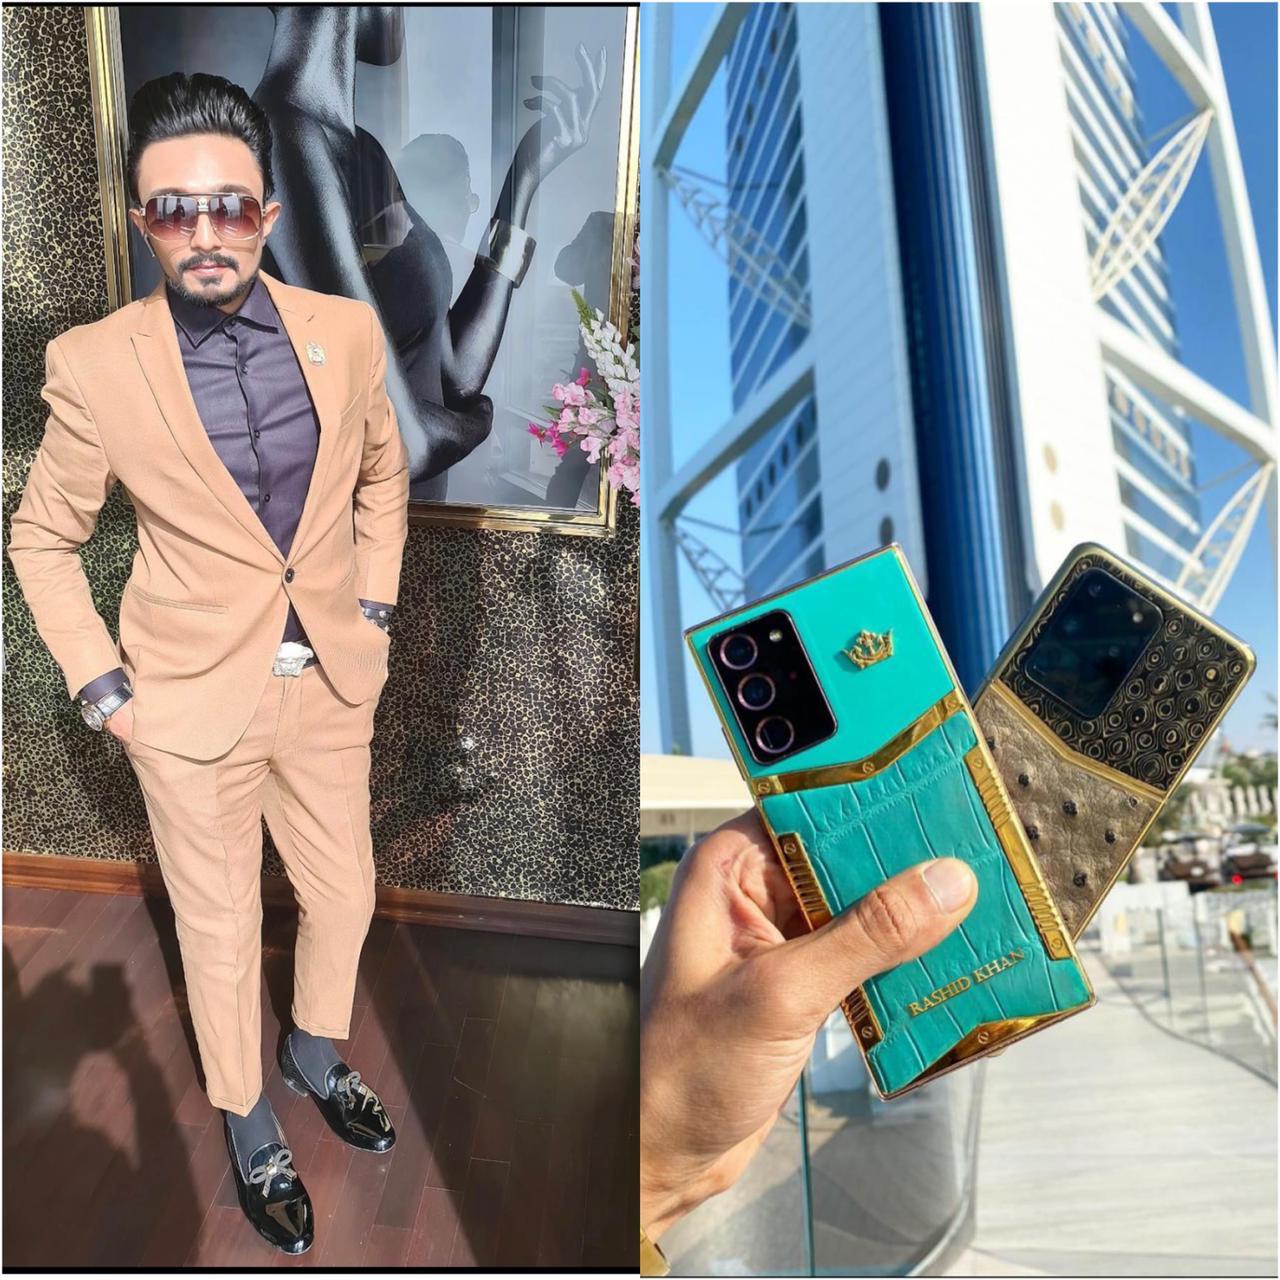 Mohammed Rashid Khan provides the world's most expensive Custom Luxurious phones.